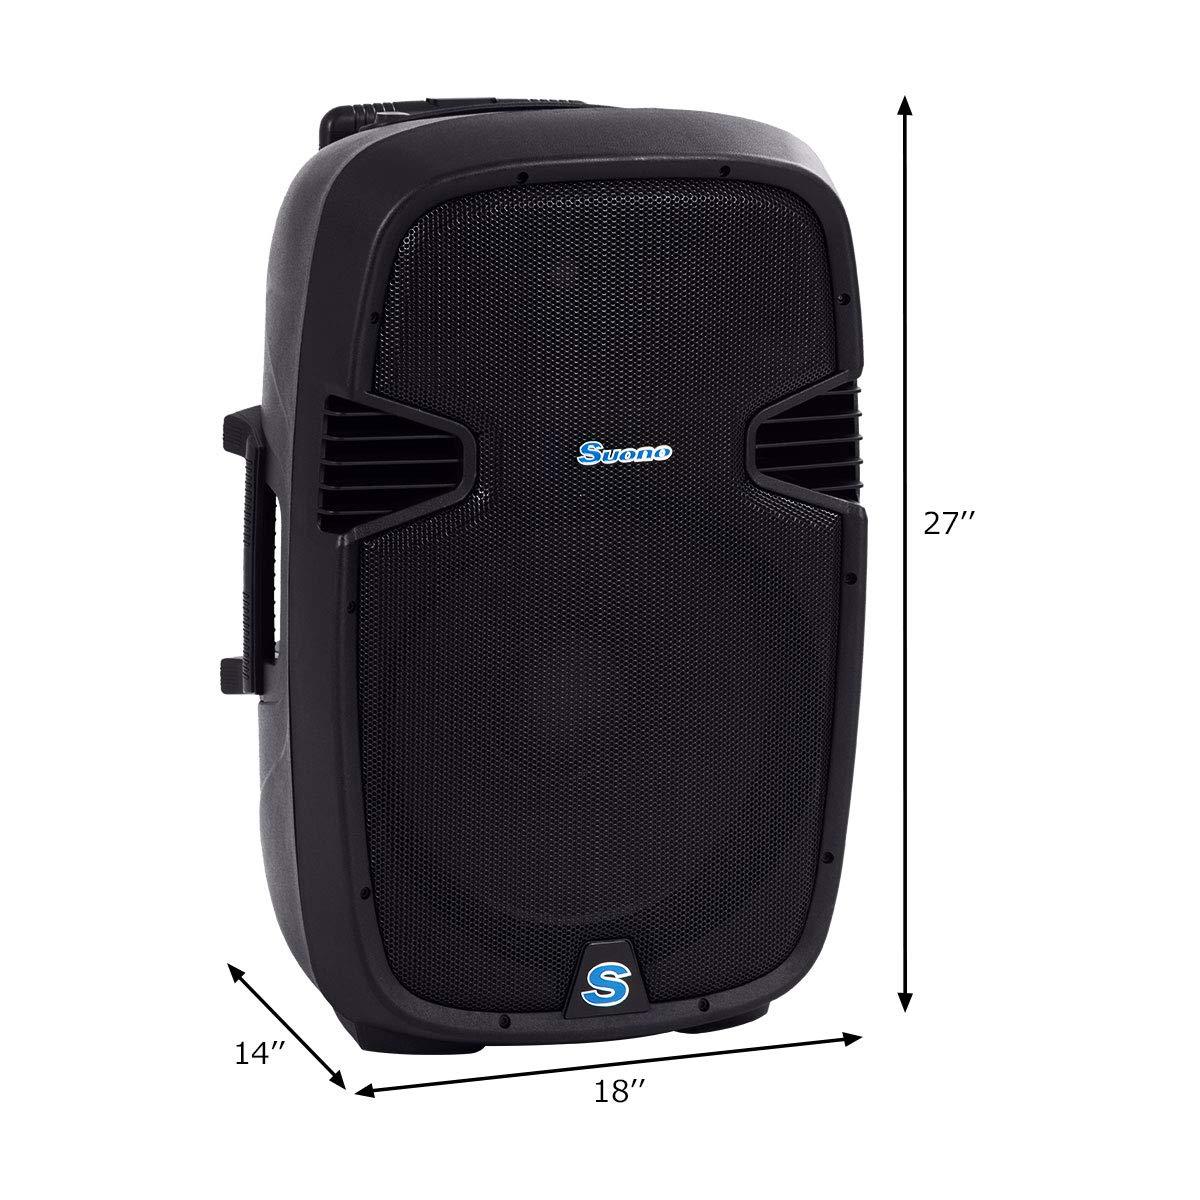 Suono Powered Speakers, 2-Way Full Range Portable DJ/PA Speaker System Set With Microphones/USB/Bluetooth (15'' 1000W) by Suono (Image #7)